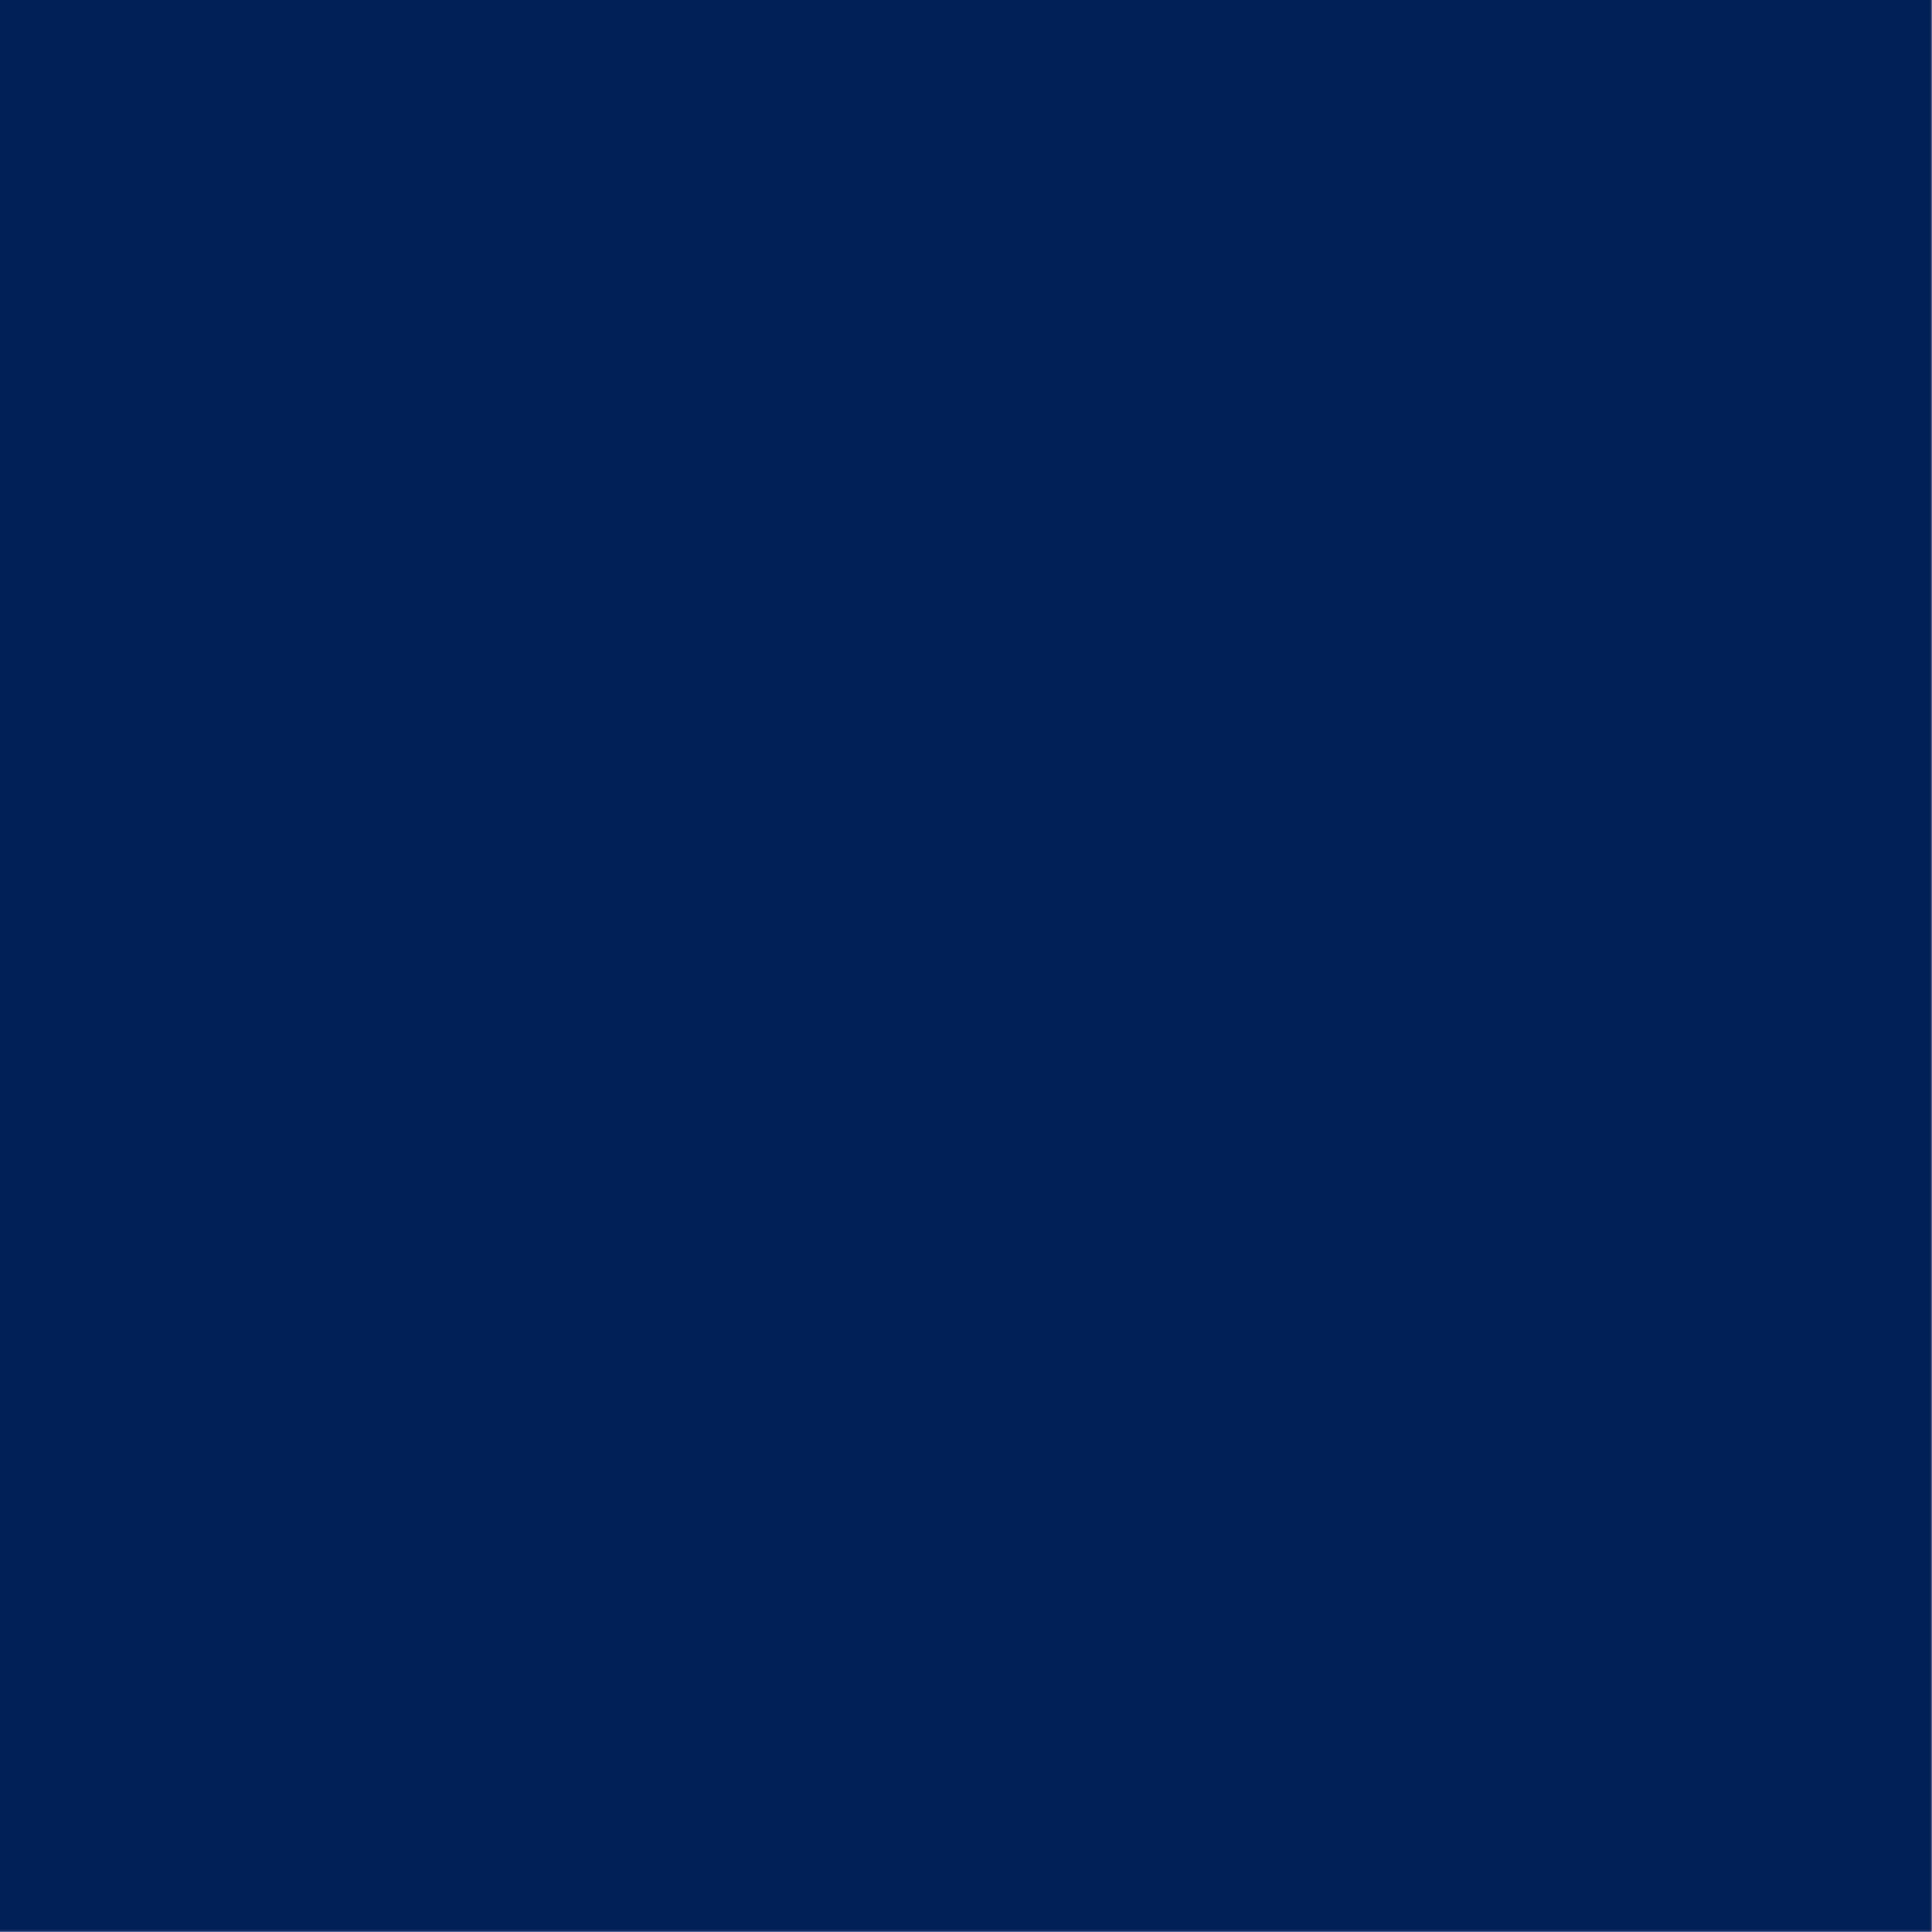 22. Navy Blue